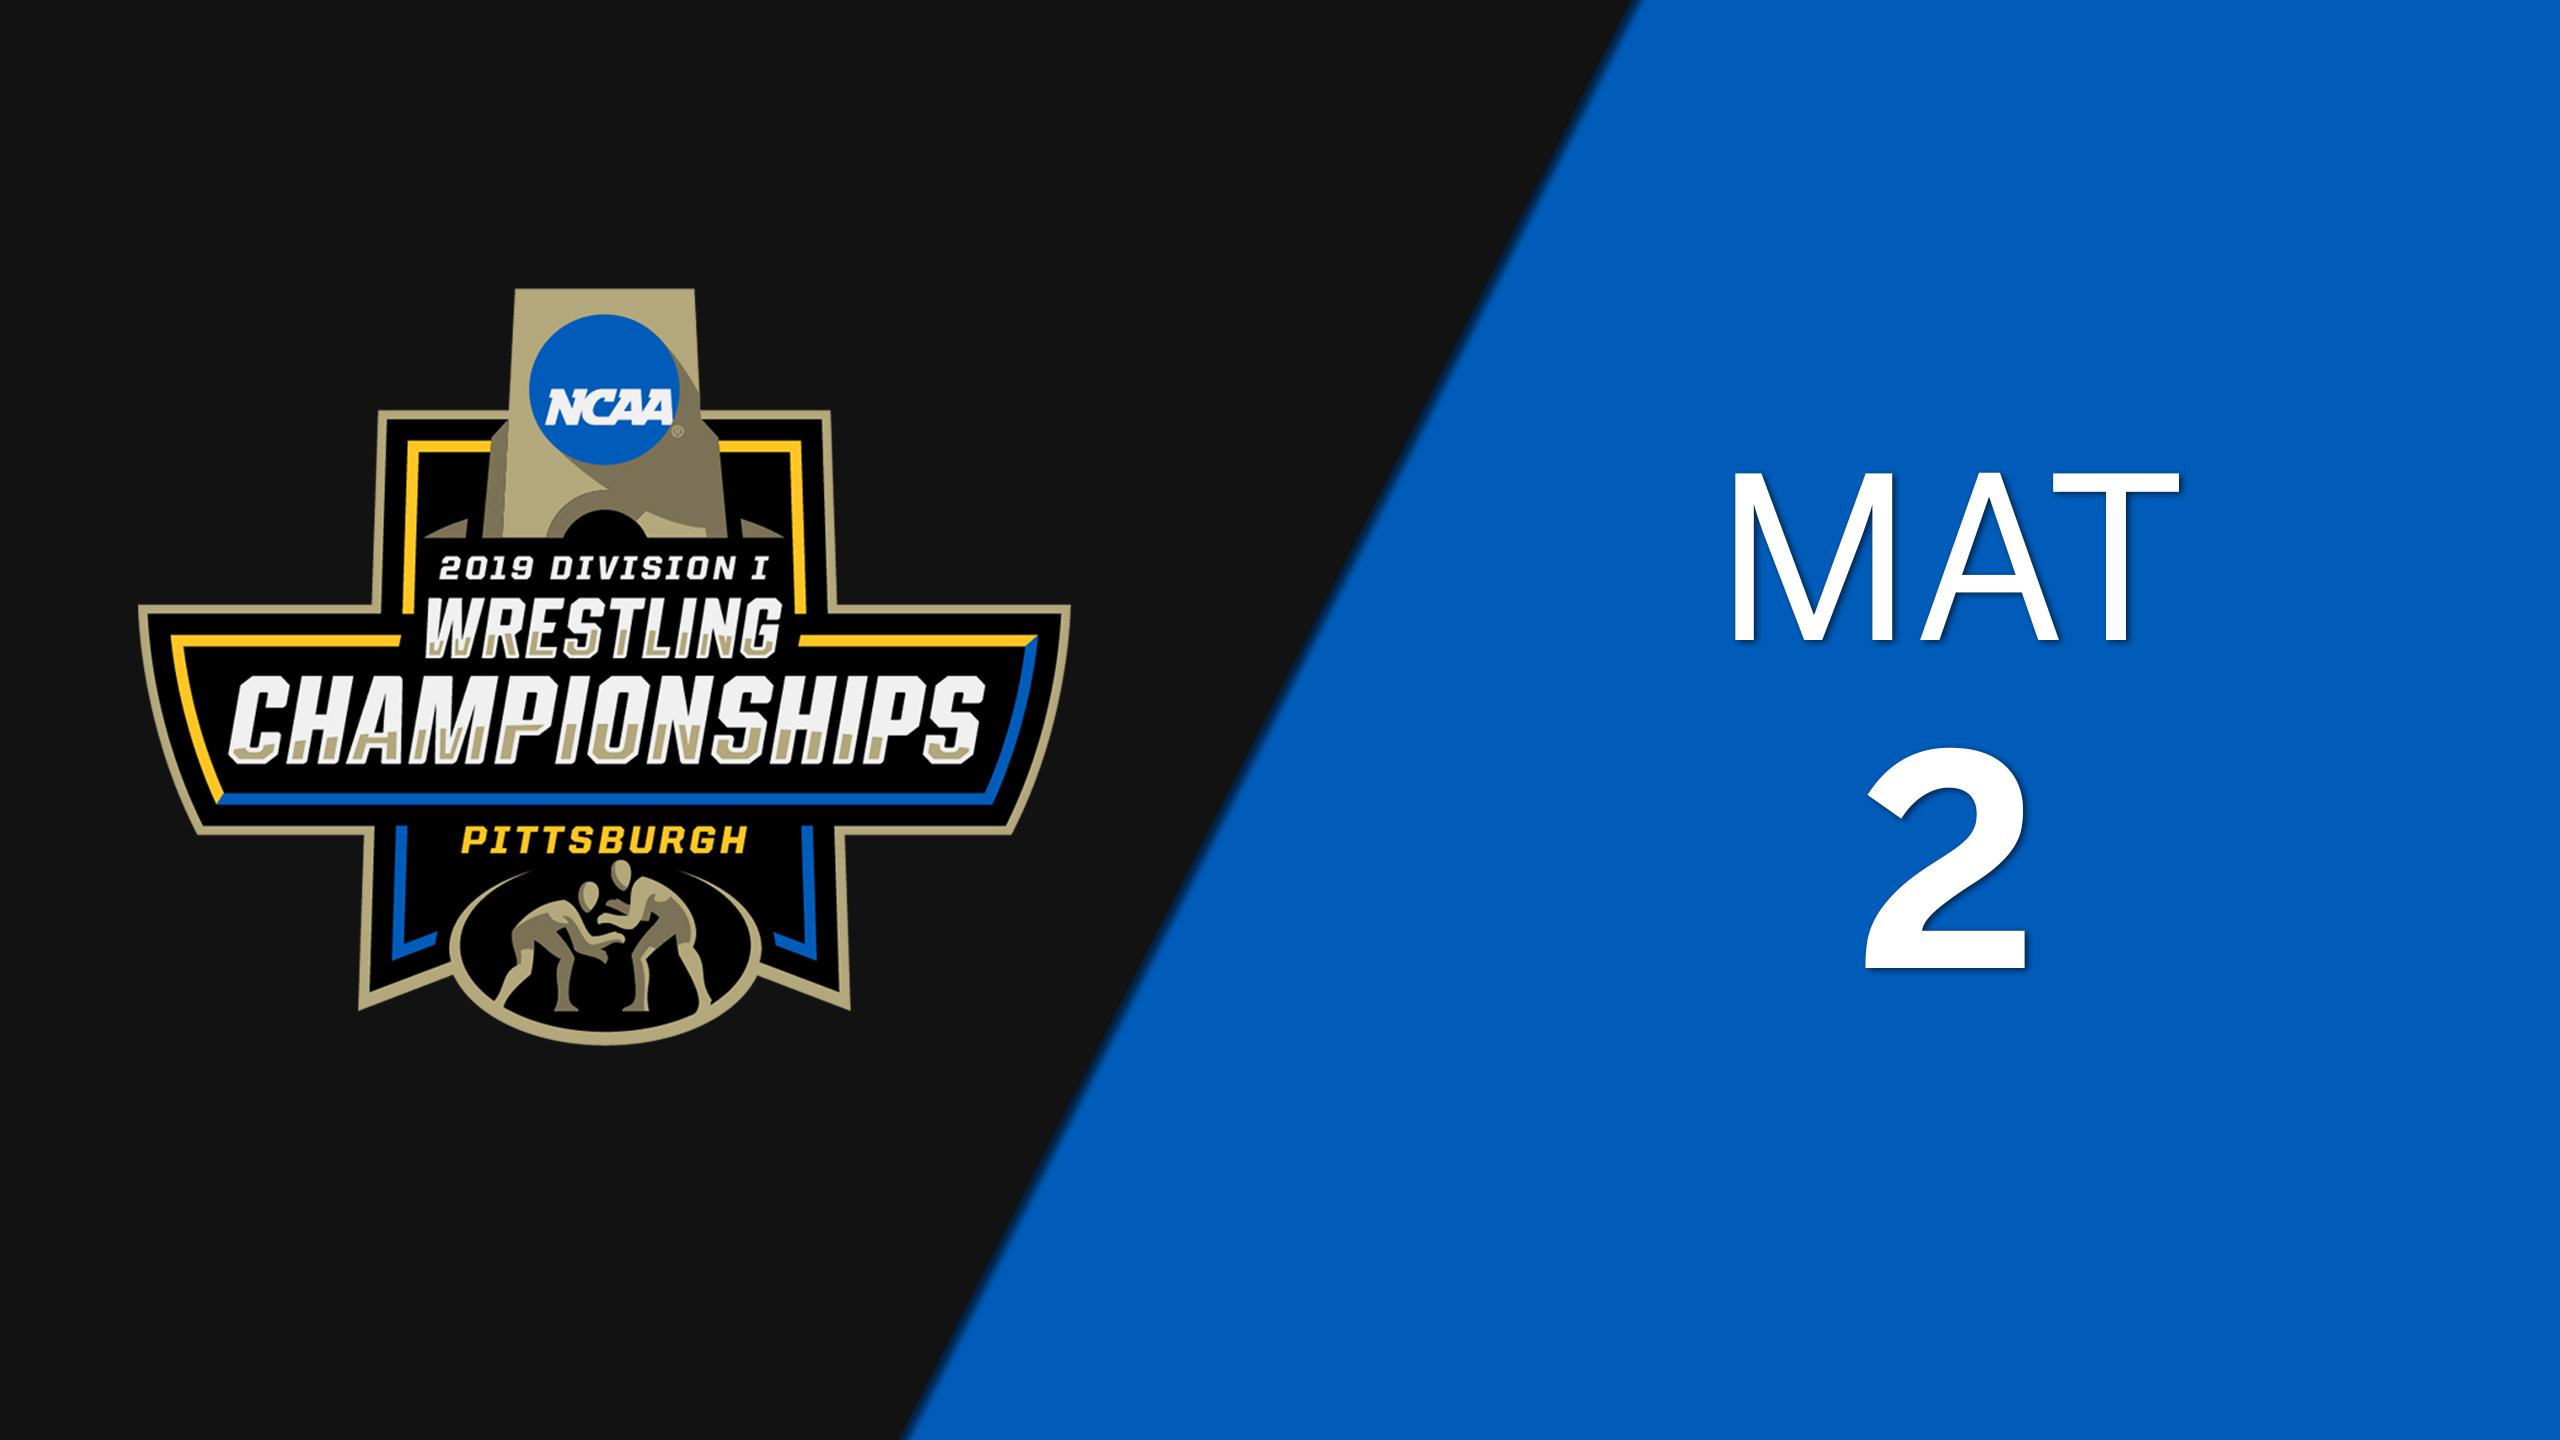 NCAA Wrestling Championship (Mat 2, Semifinals)